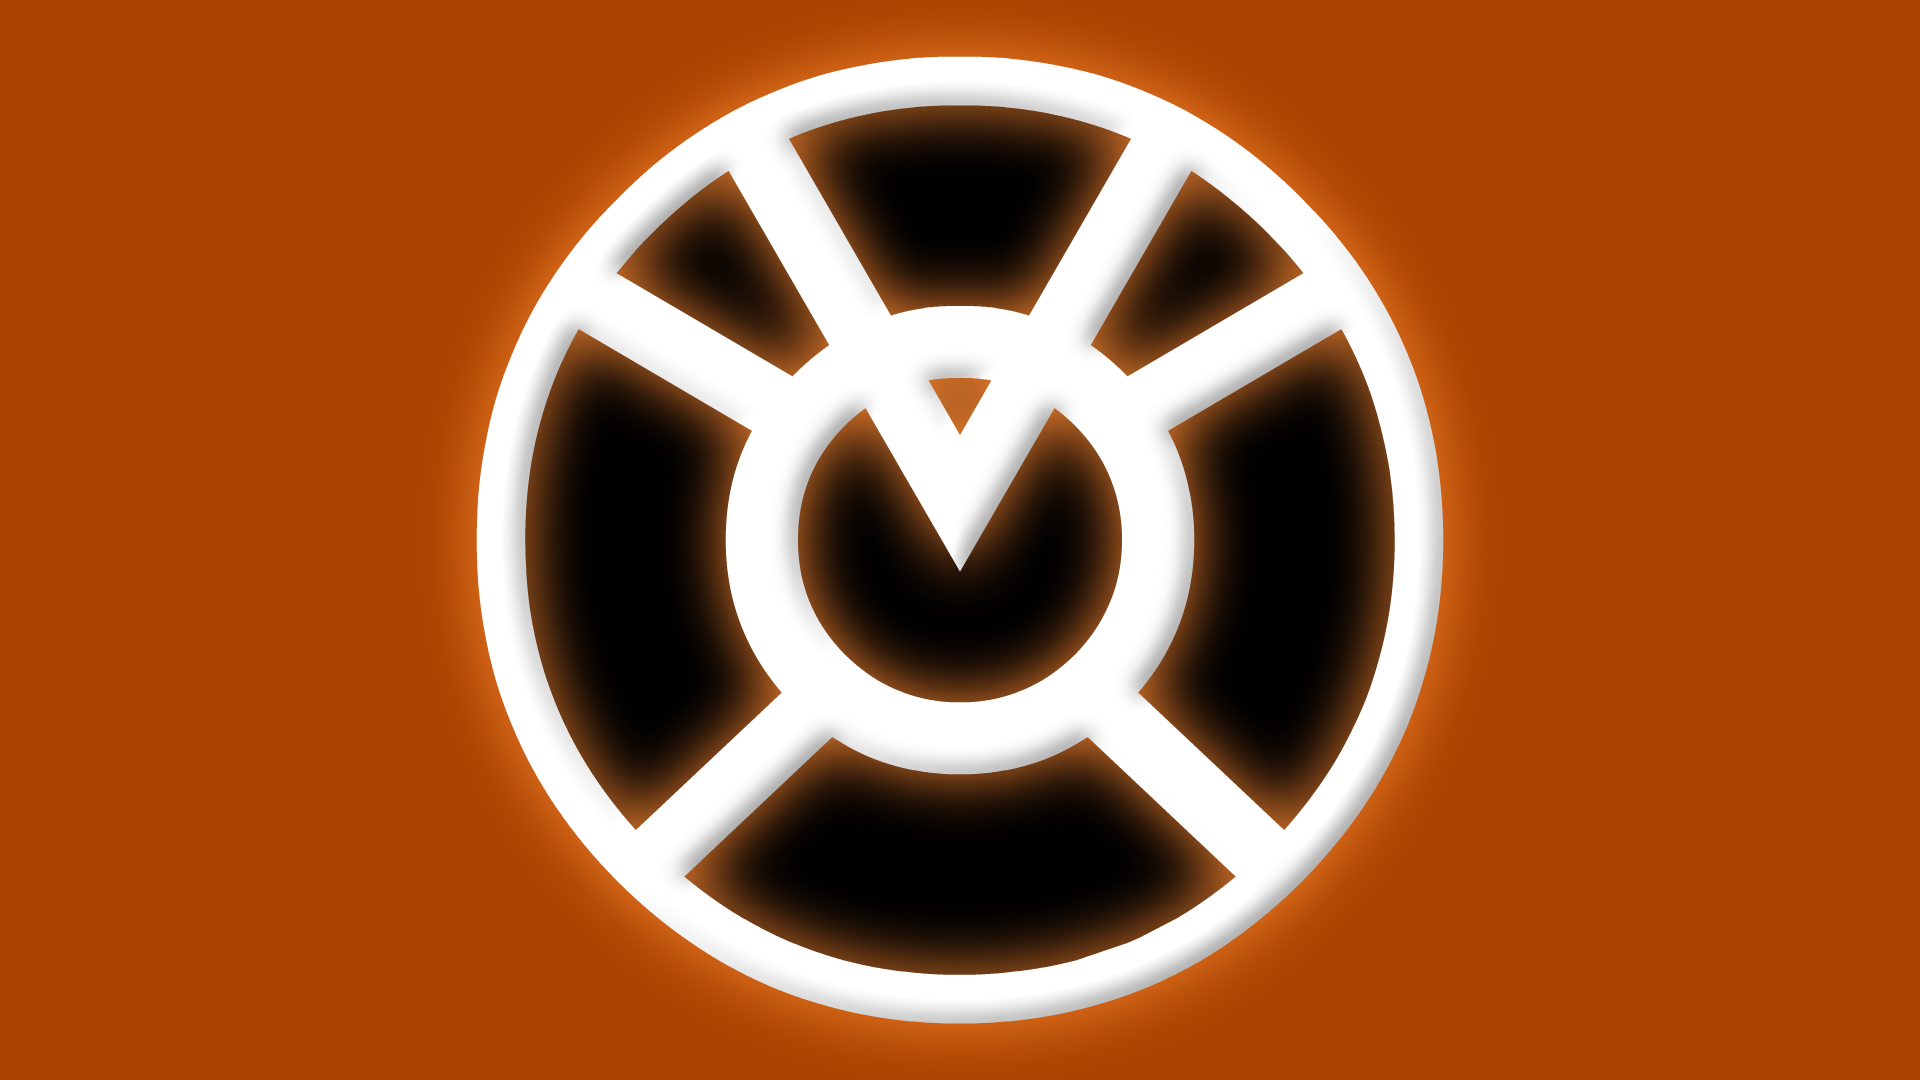 Orange Lantern Symbol by Yurtigo on DeviantArt